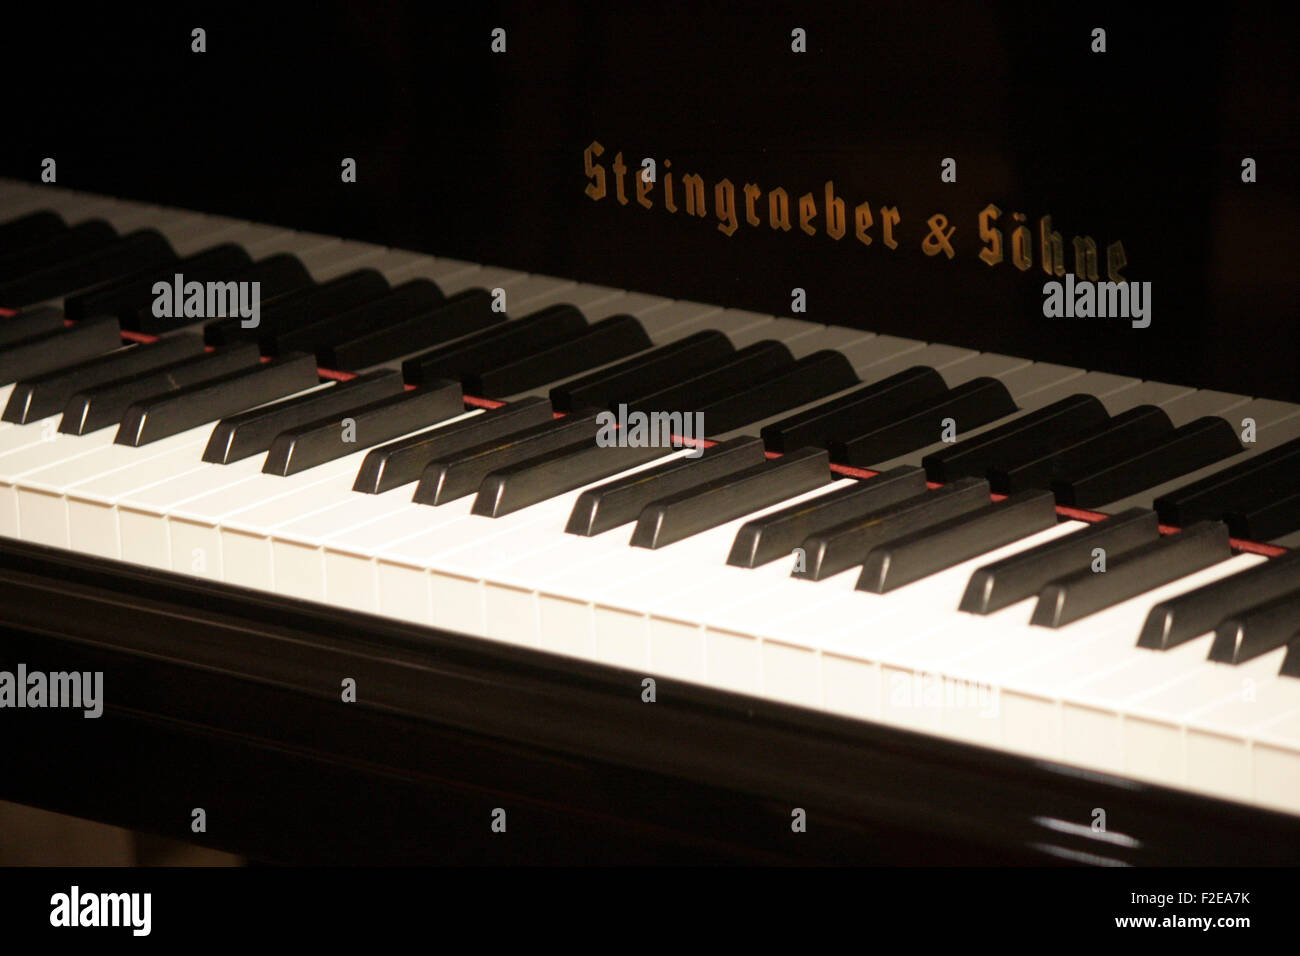 Concert Grand Piano Stock Photos & Concert Grand Piano Stock Images ...